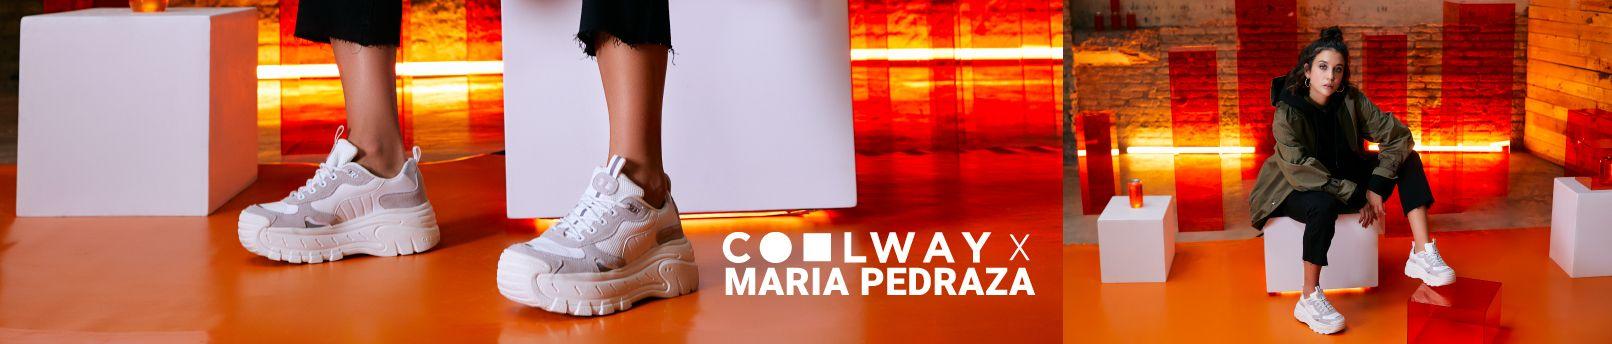 Descubre Coolway